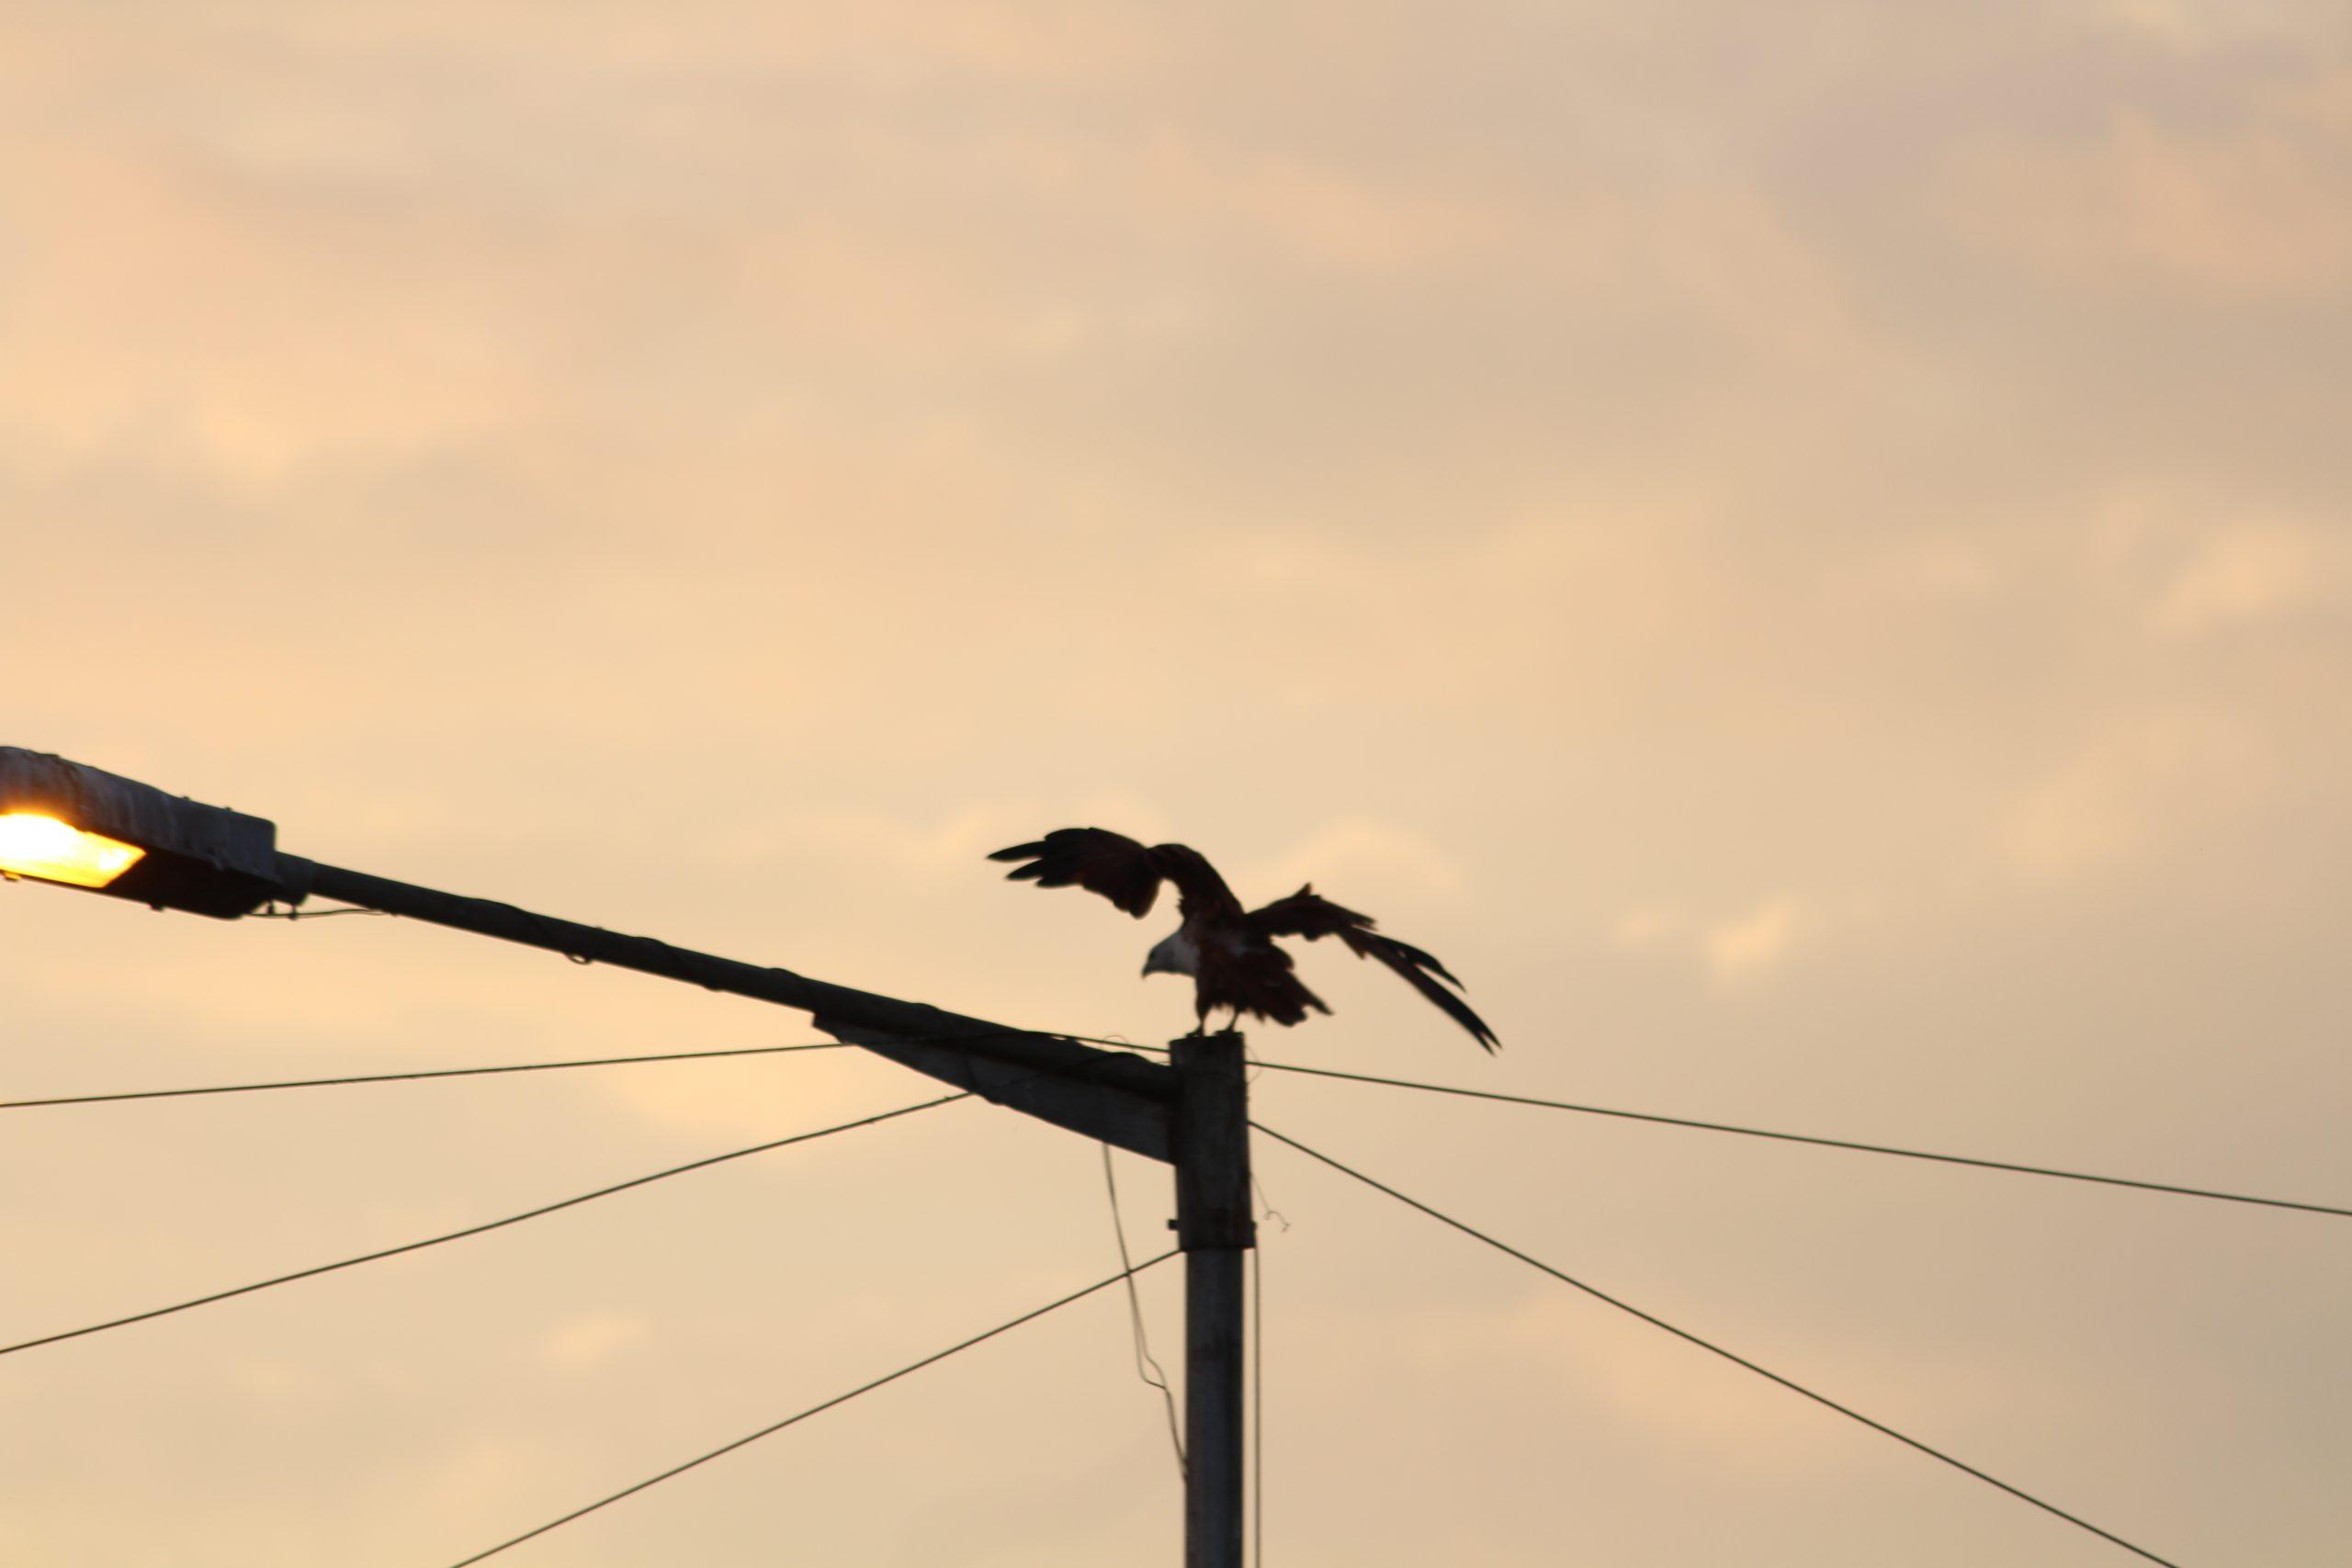 Bird on Electric Pole